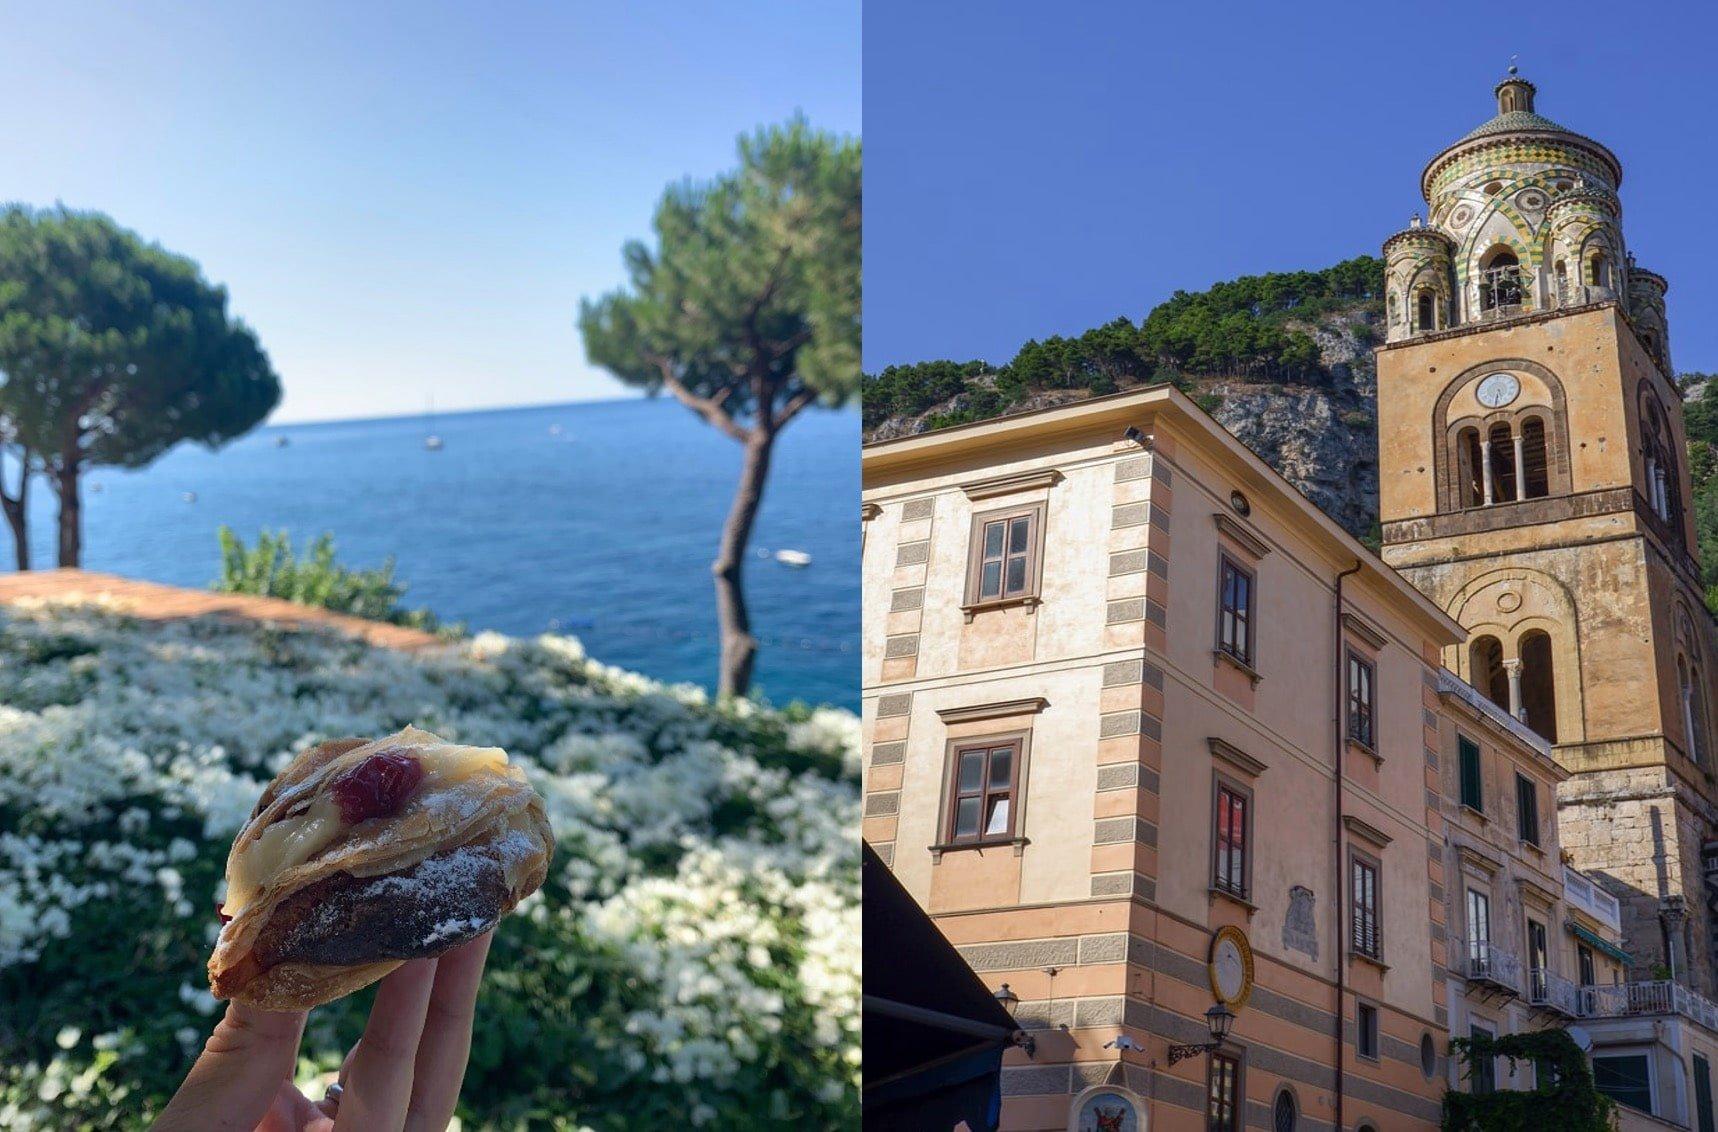 Gastronomic itinerary of the Amalfi Coast